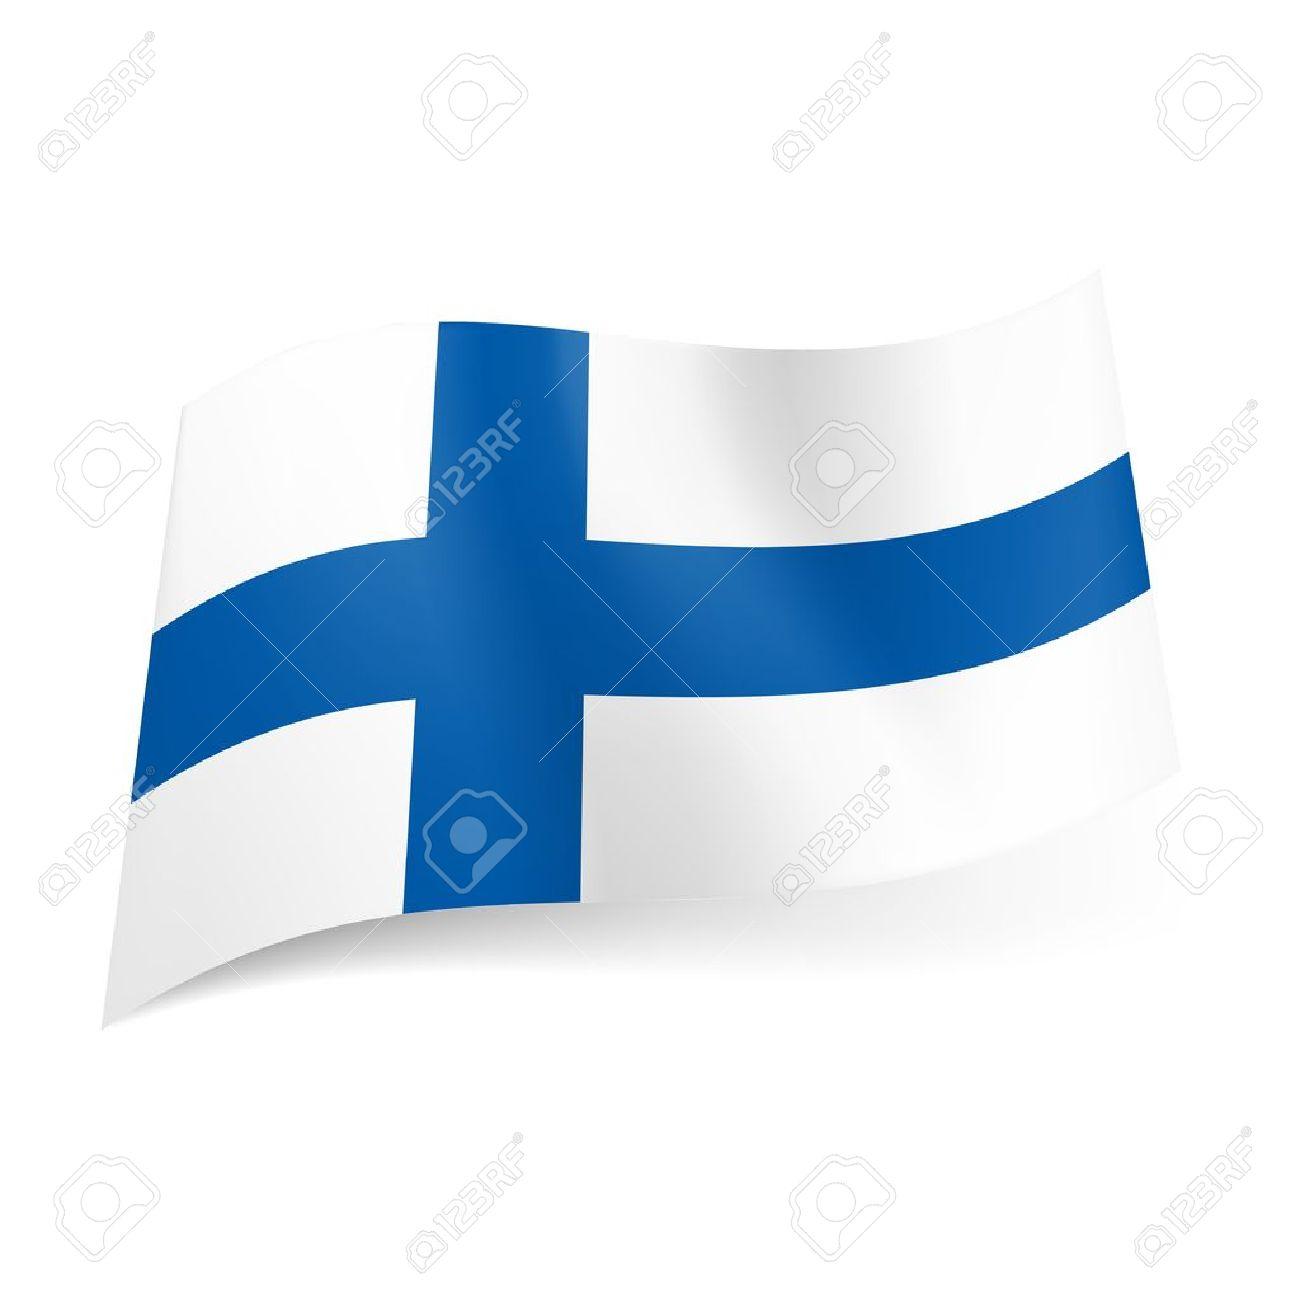 National flag of Finland: blue cross on white background. Stock Vector - 21576002